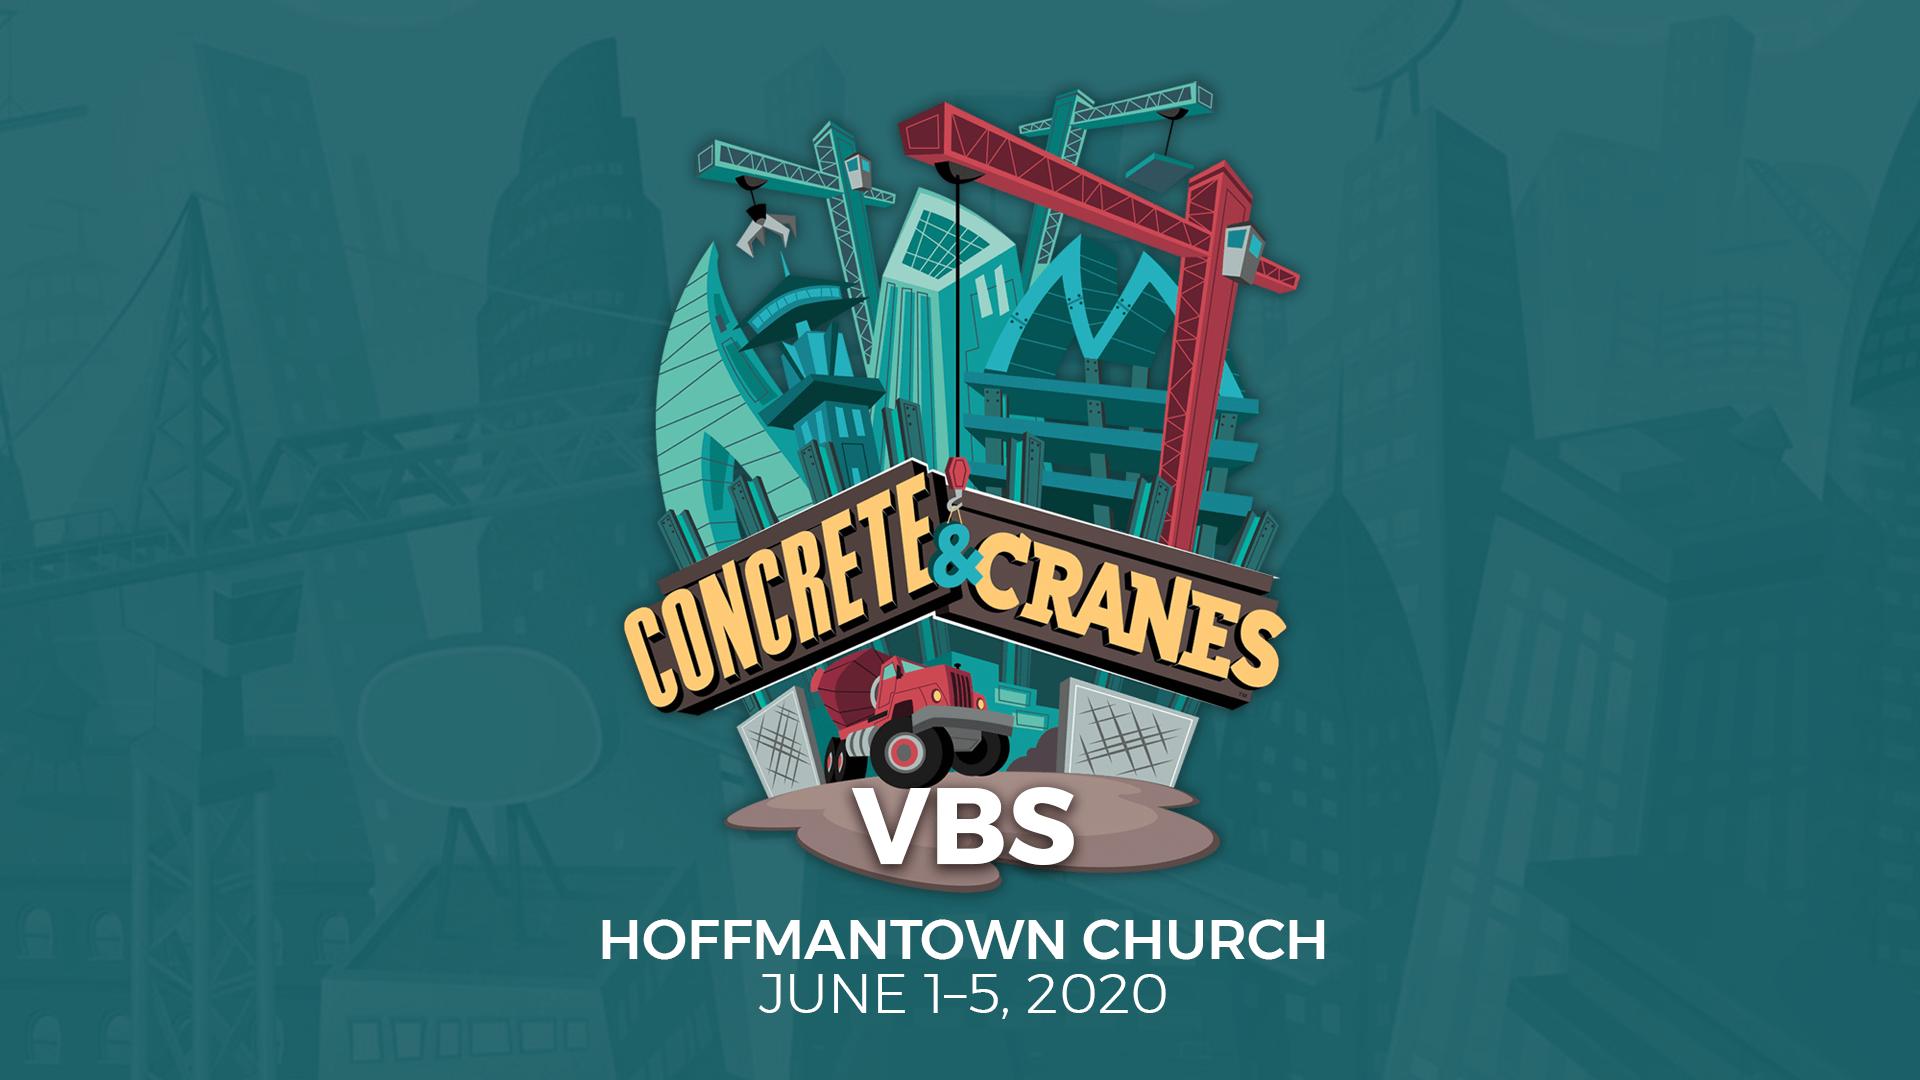 Hoffmantown Church 2020 VBS Concrete and Cranes